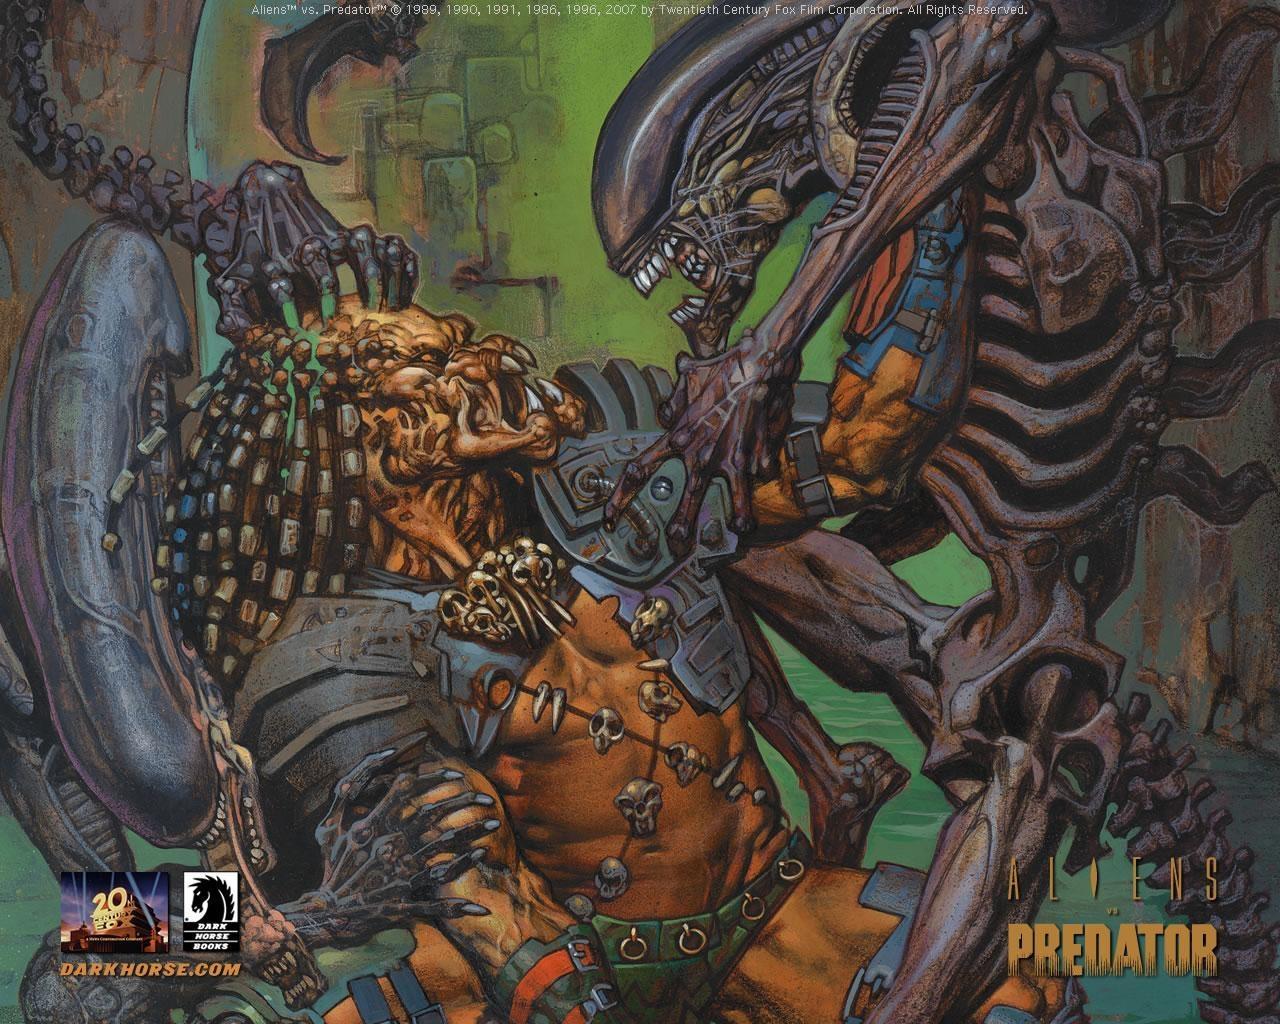 Aliens Vs. Predator wallpapers HD quality